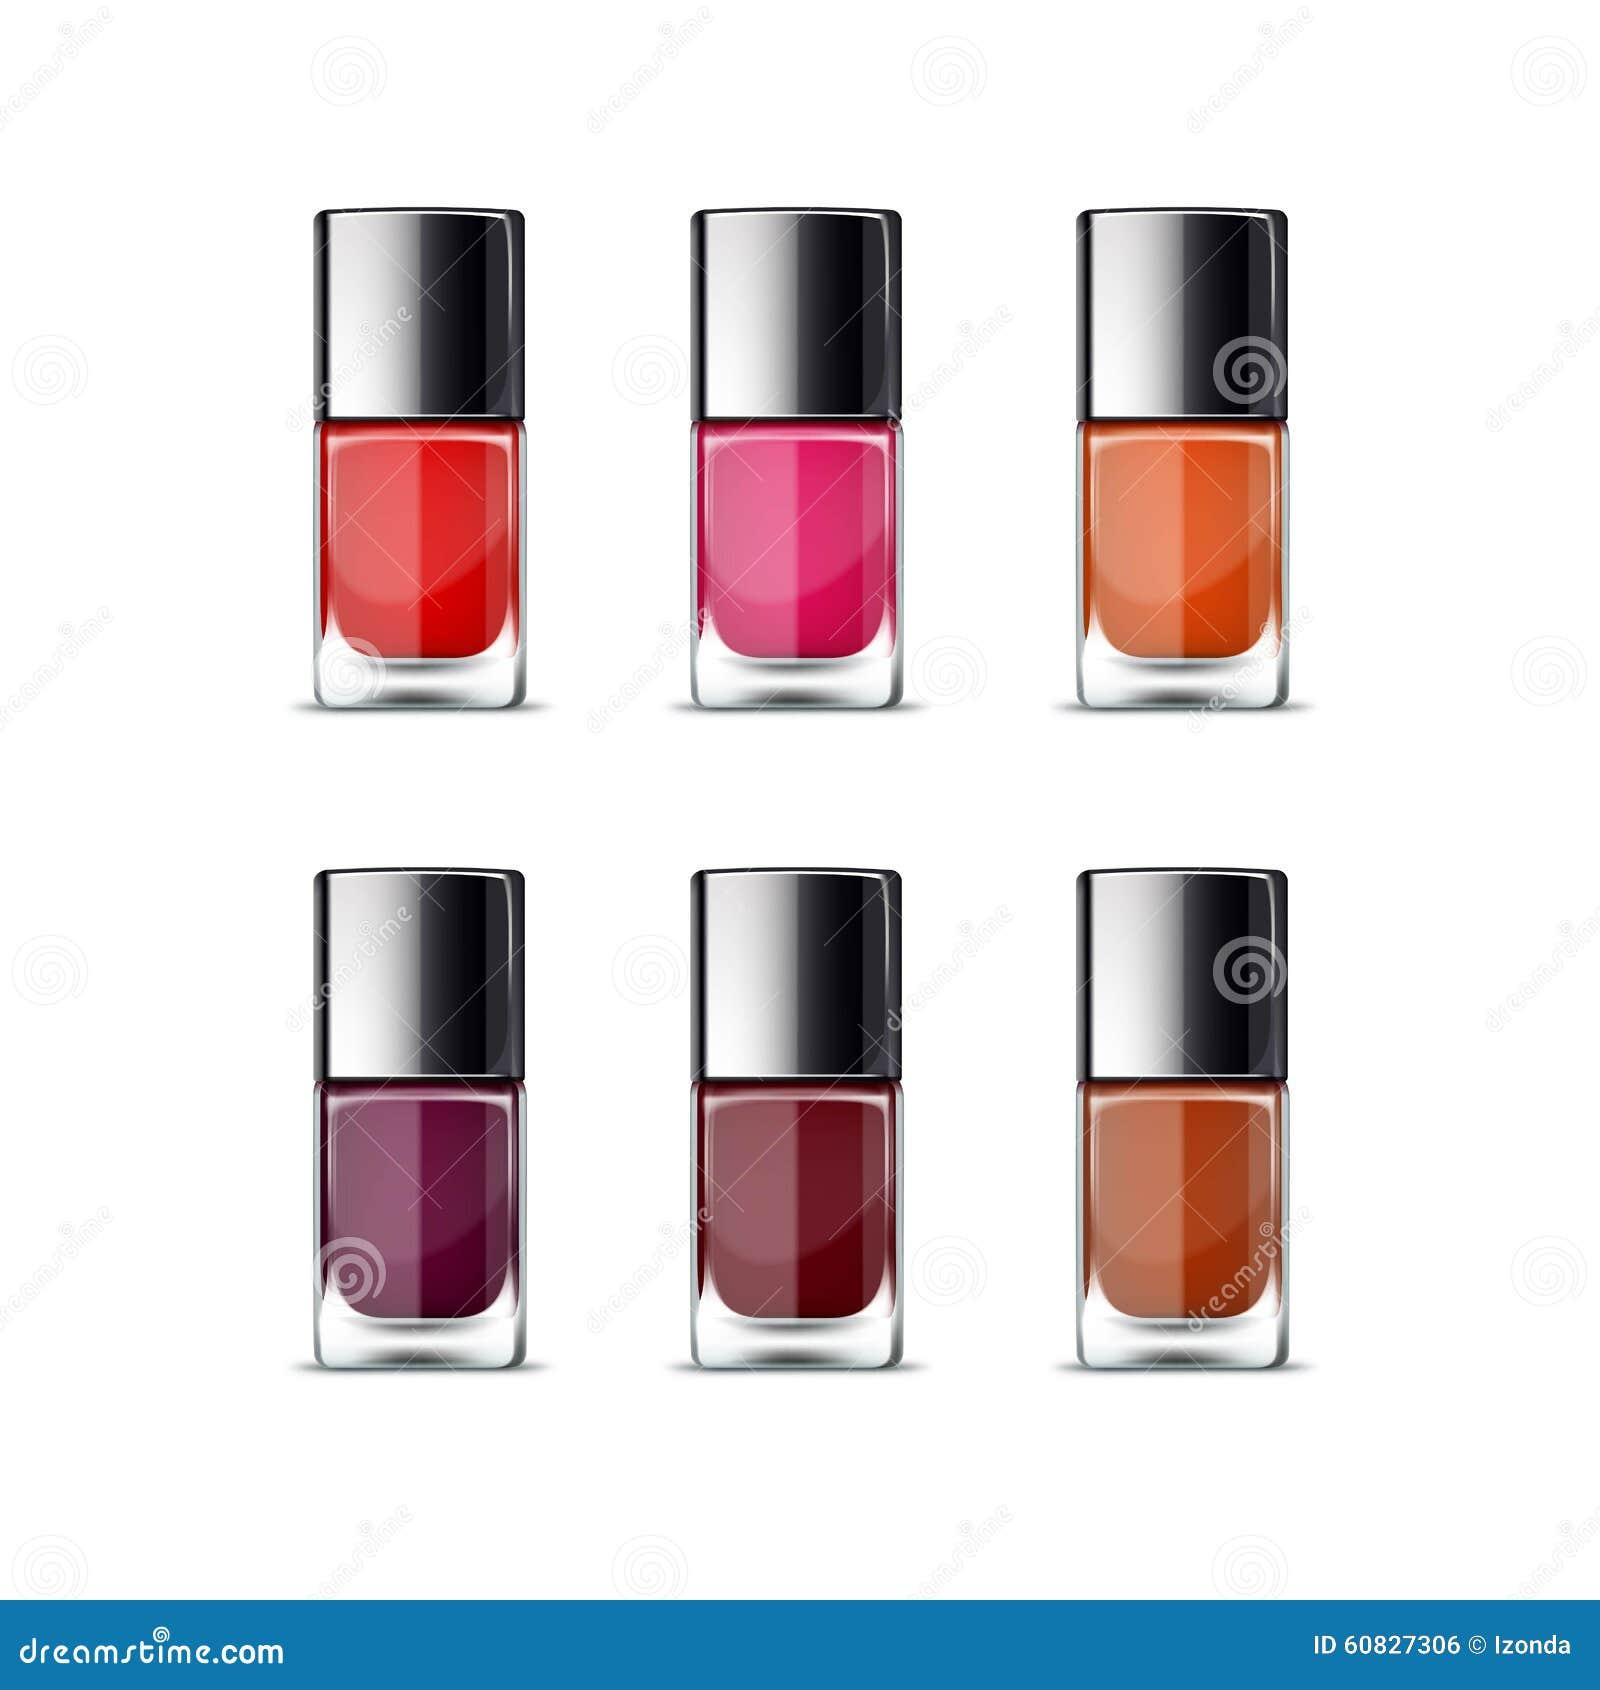 Nail Polish Package: Nail Polish Packaging Package Bottle For Manicure